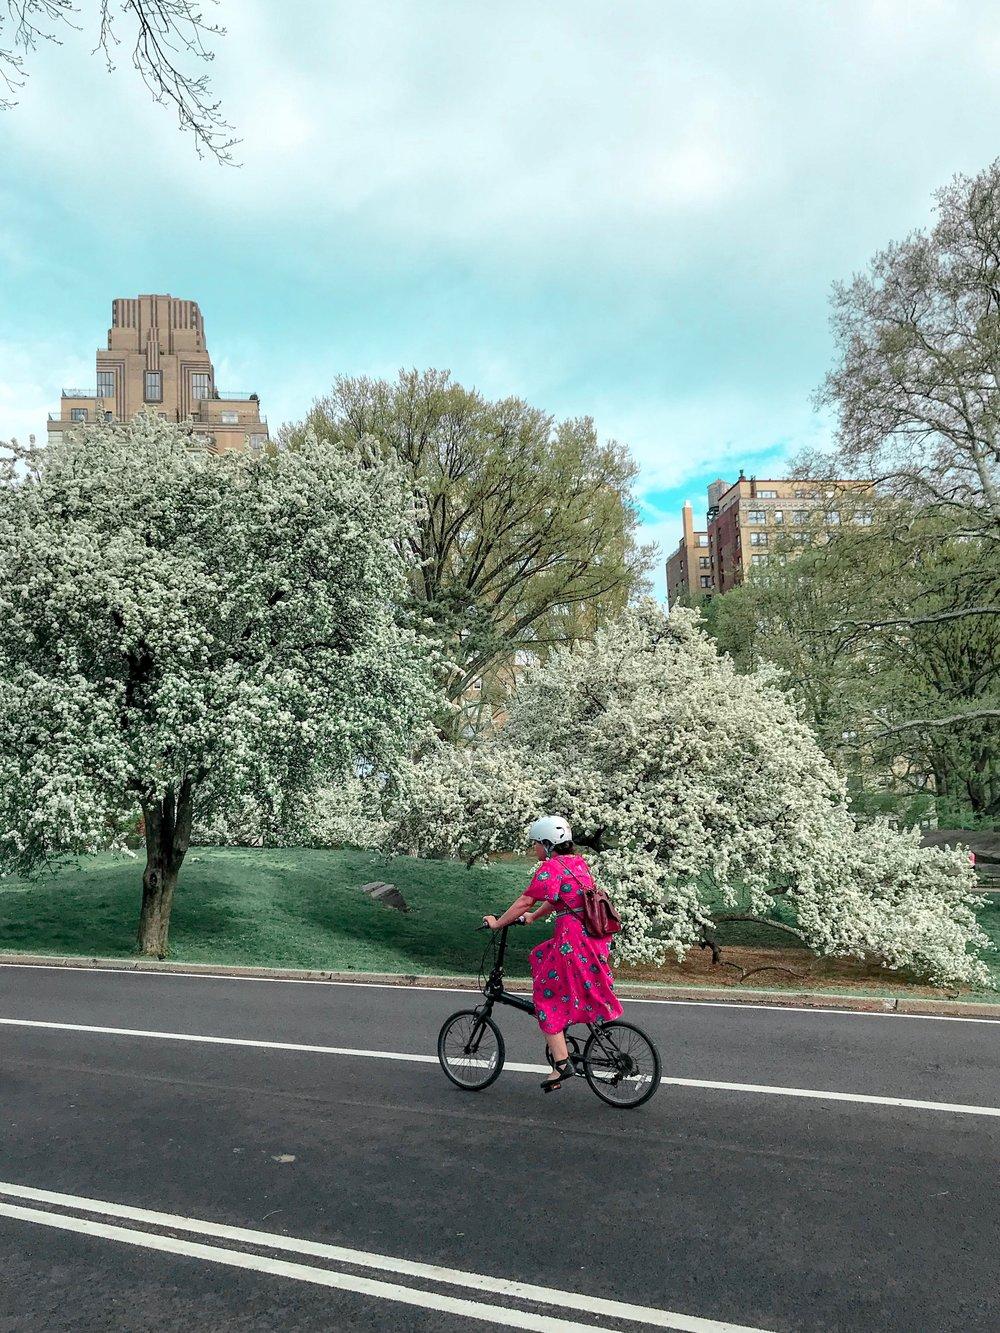 Central Park - West 92nd Street